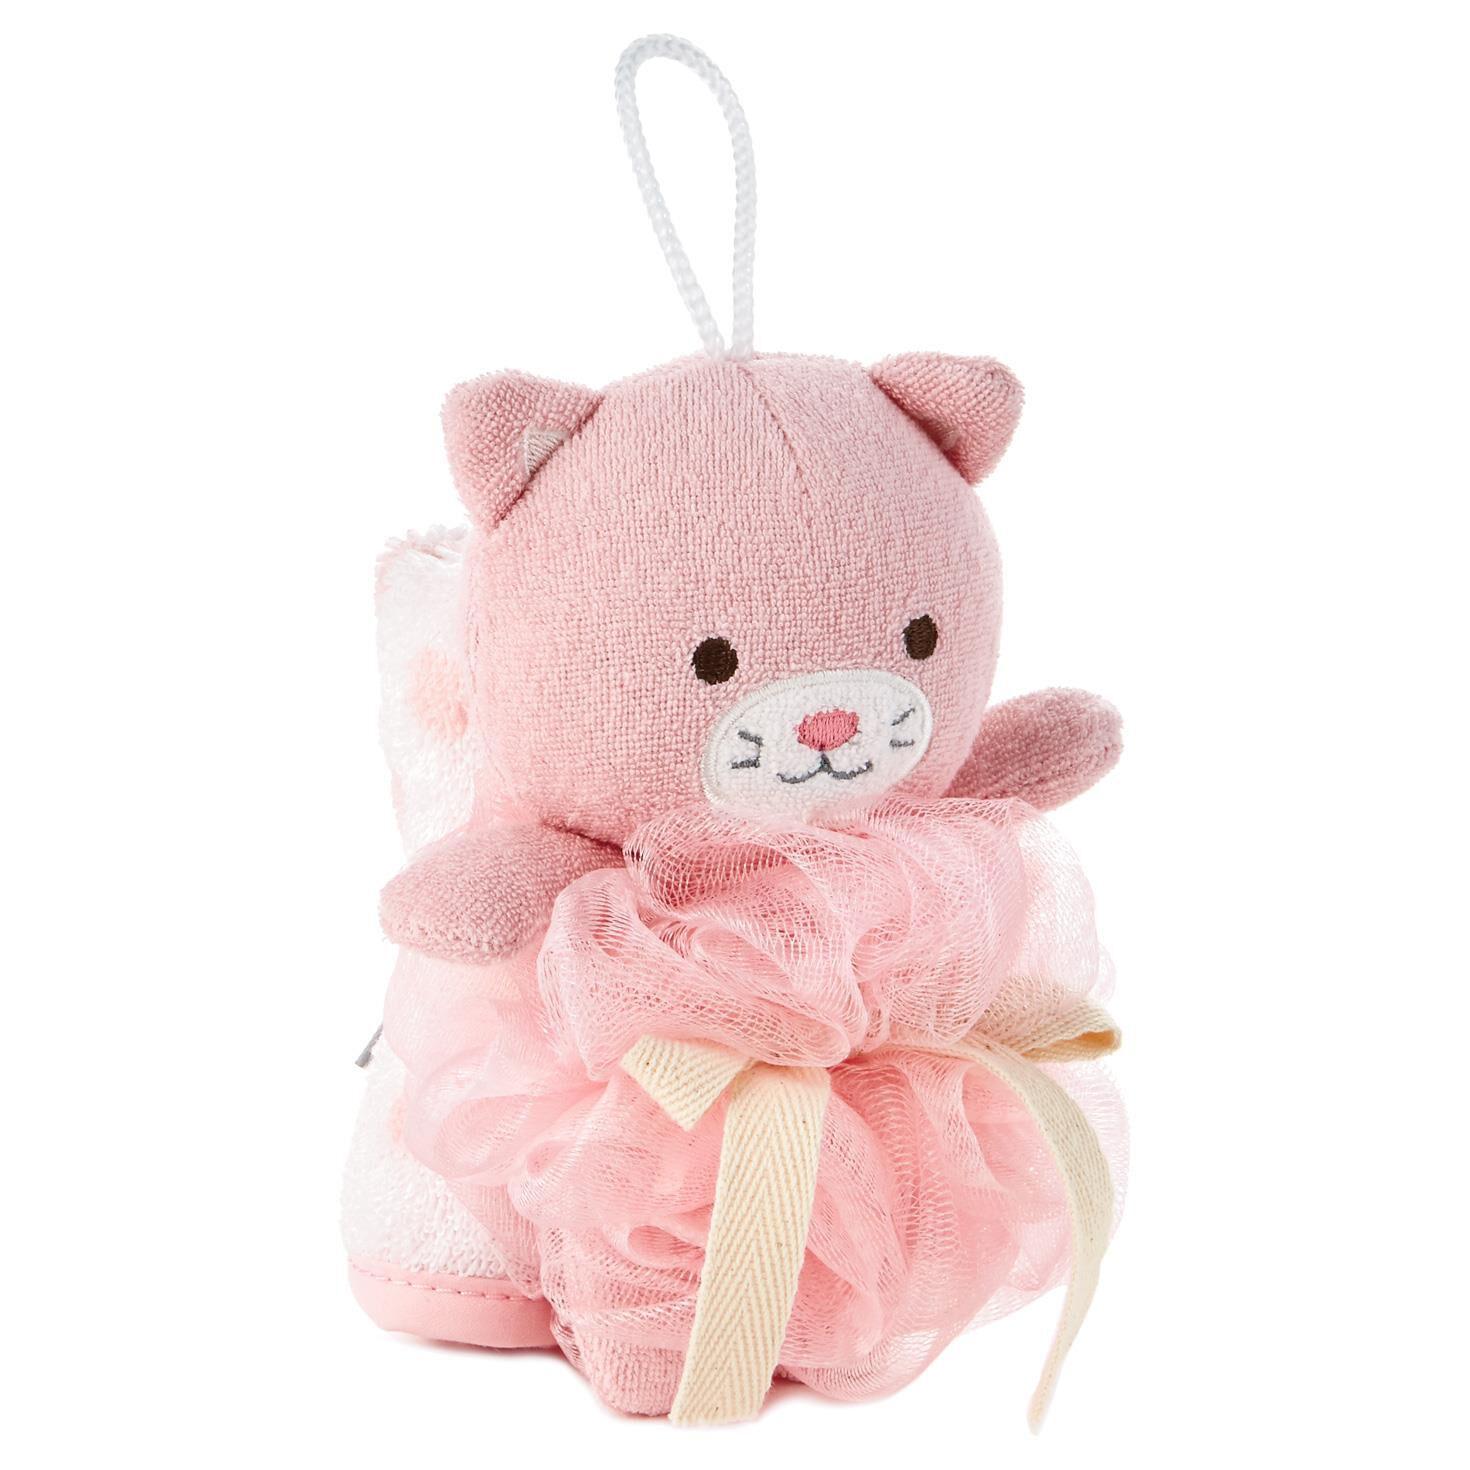 Kitty Loofah and Washcloth Baby Bath Set - Baby Essentials - Hallmark